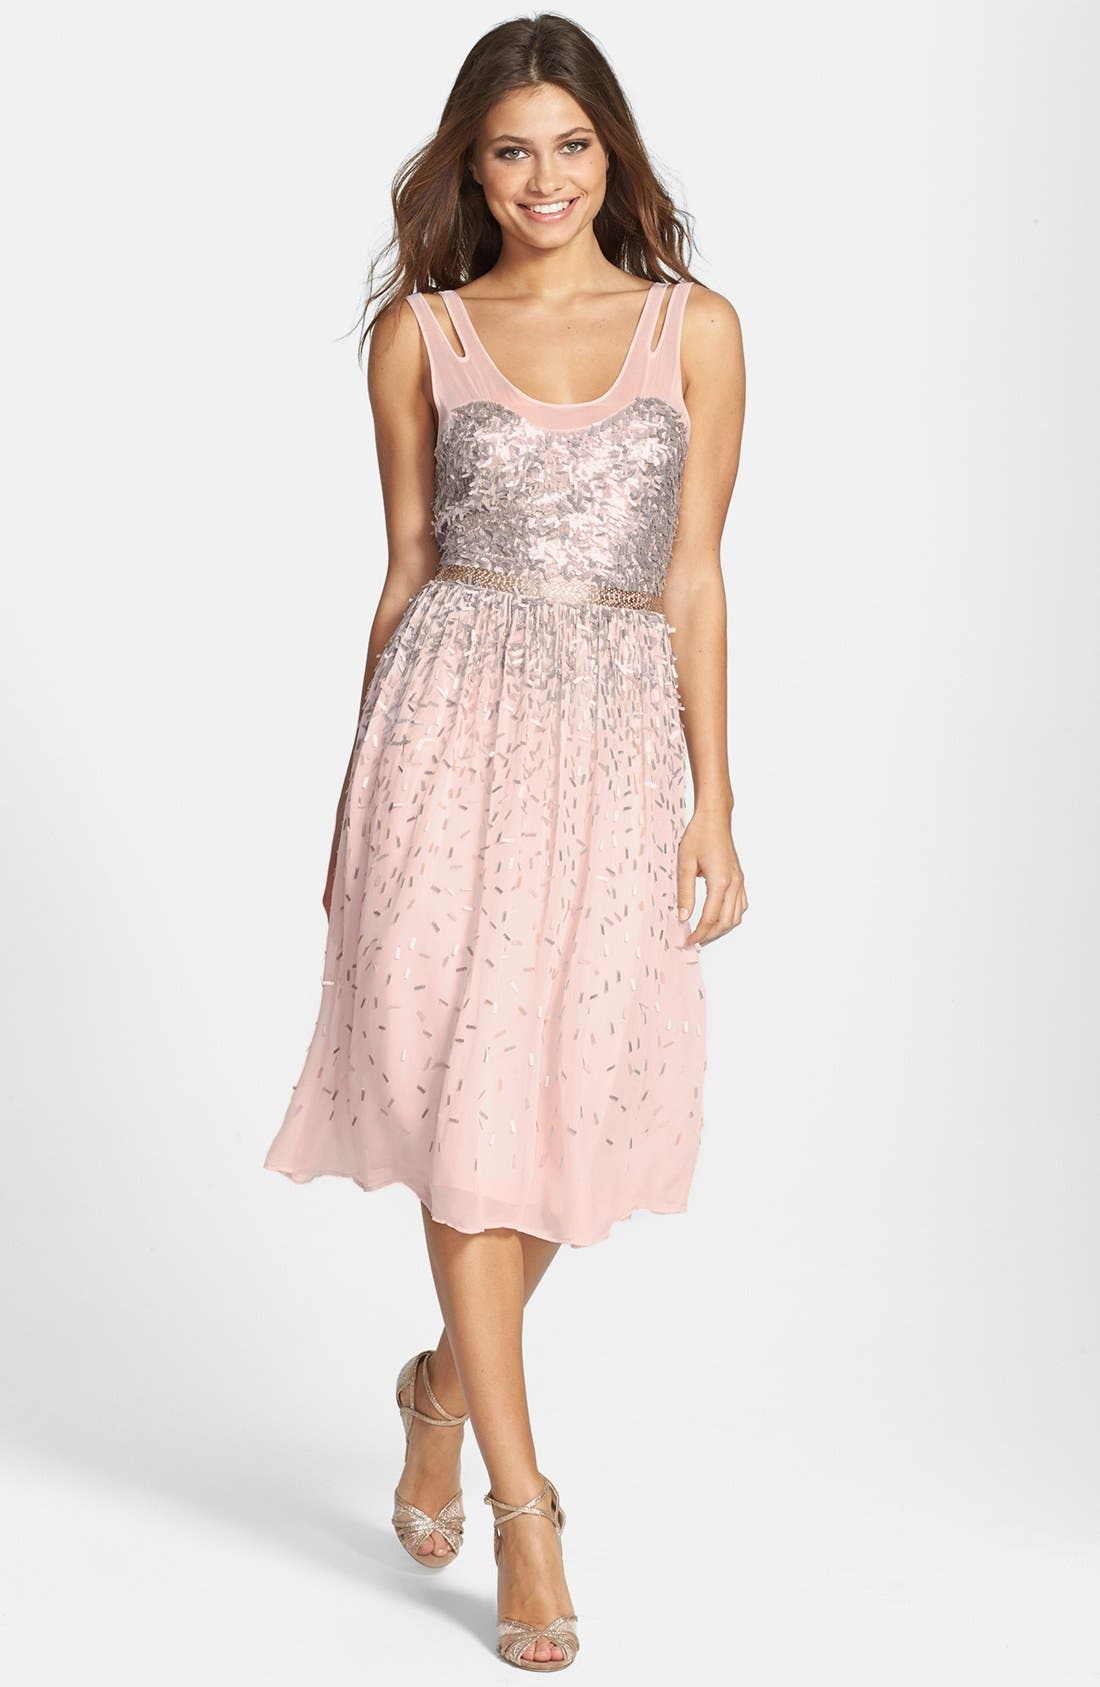 Main Image - French Connection 'Shimmer Shower' Embellished Dress